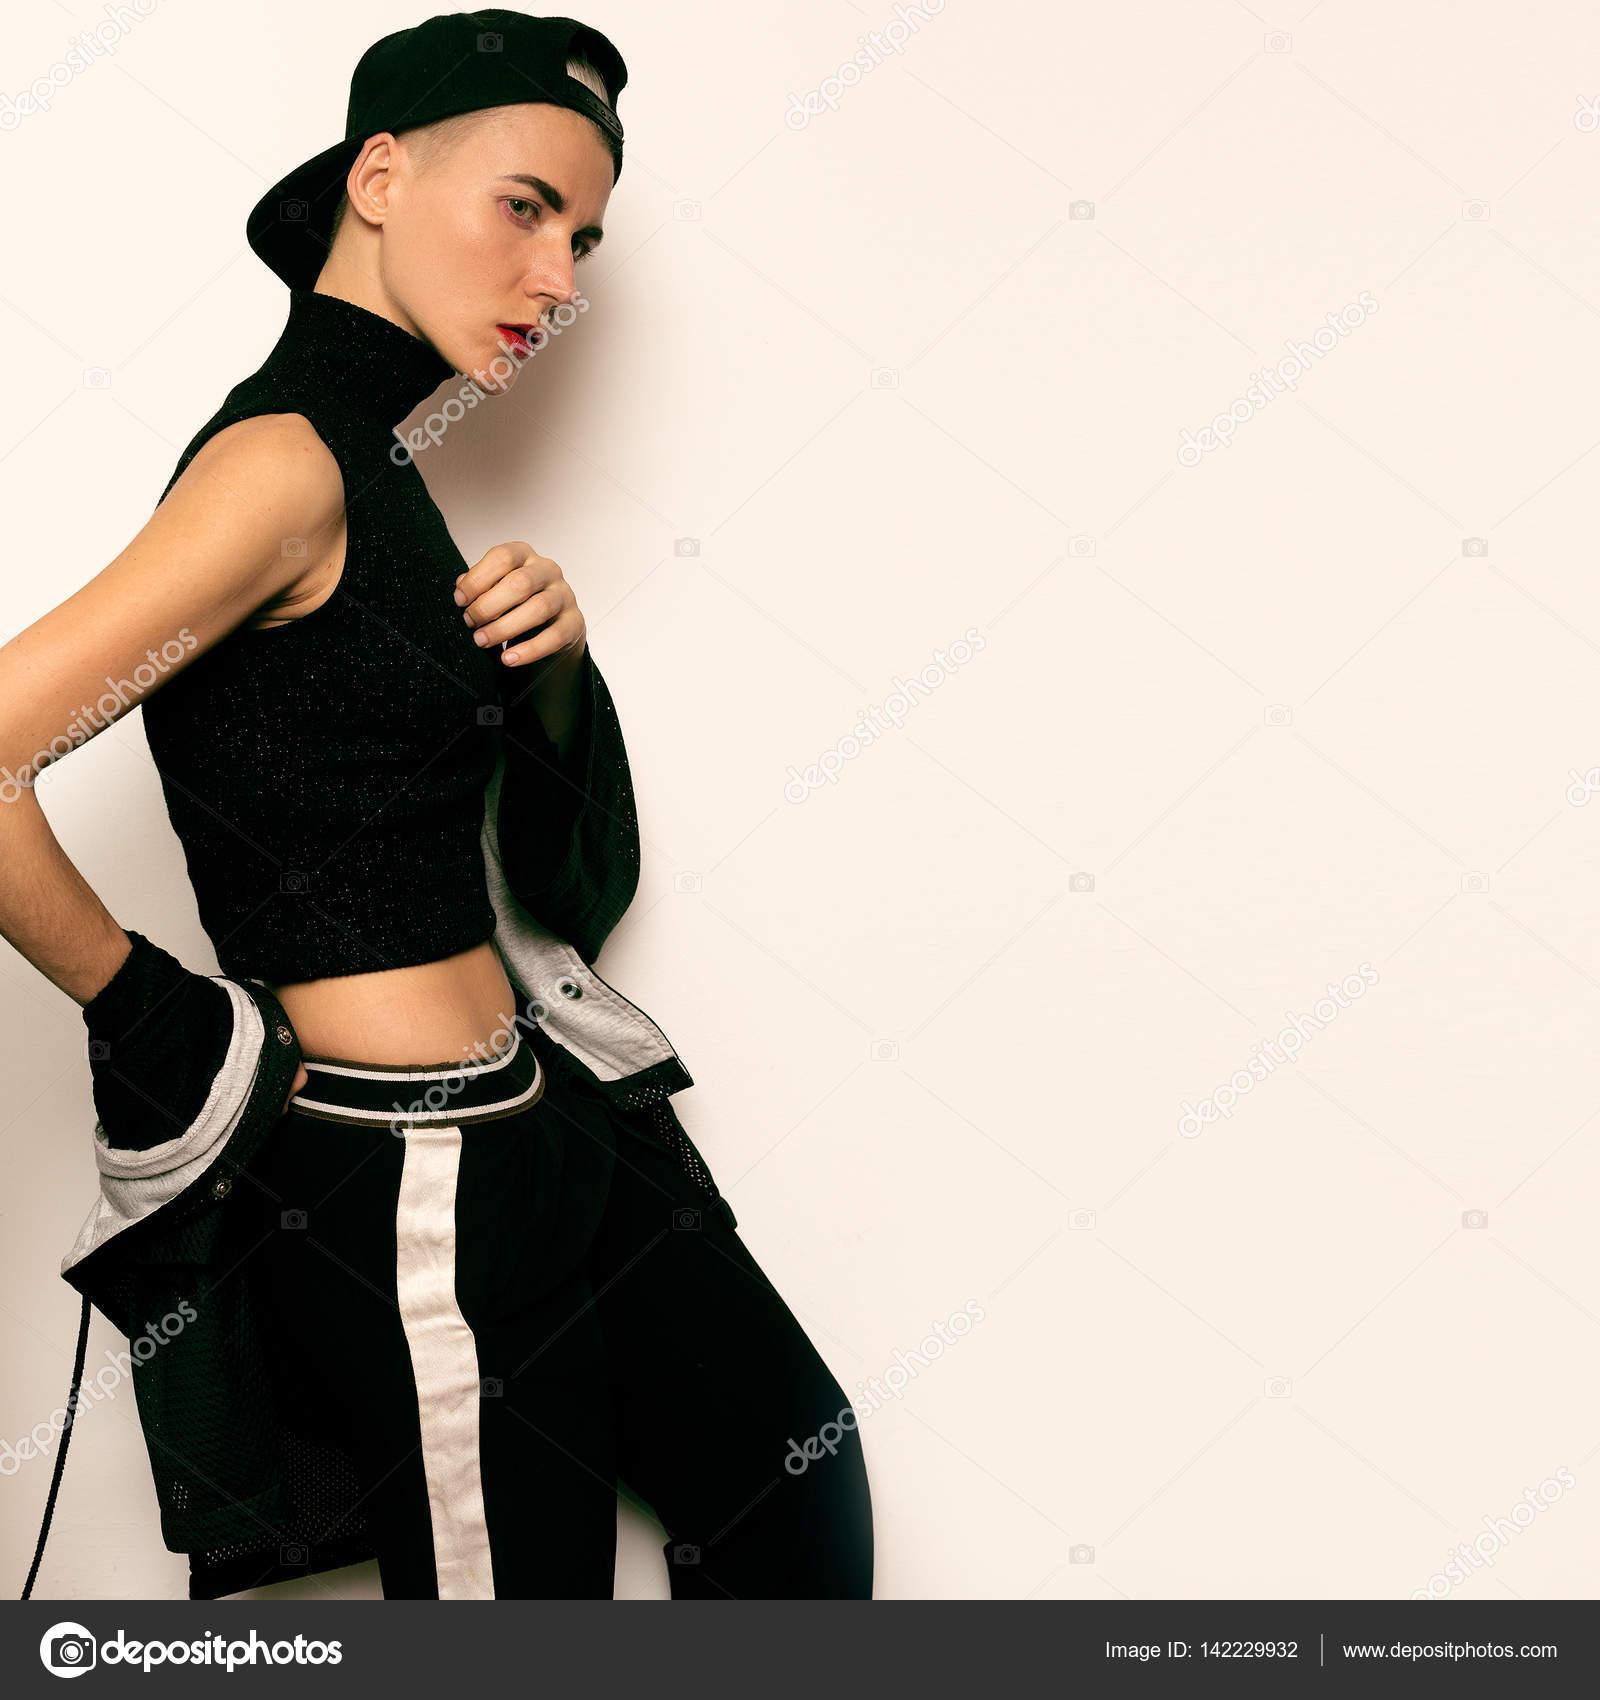 7eb4da87b22bc Tomboy chica modelo estilo urbano traje danza Hip Hop ropa — Foto de Stock